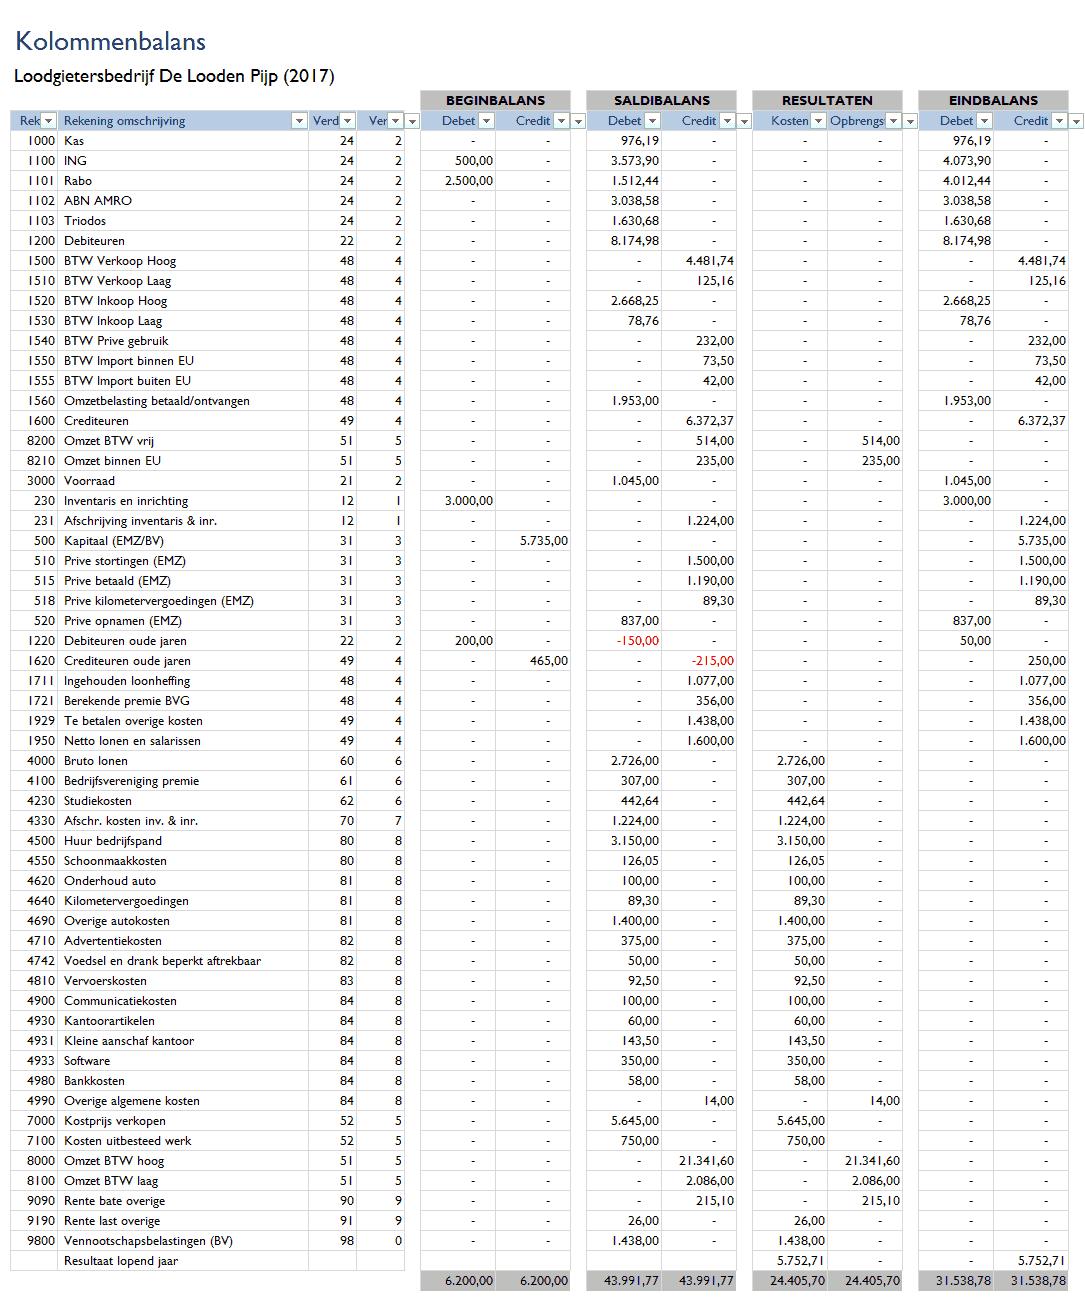 Kolommenbalans in Excel